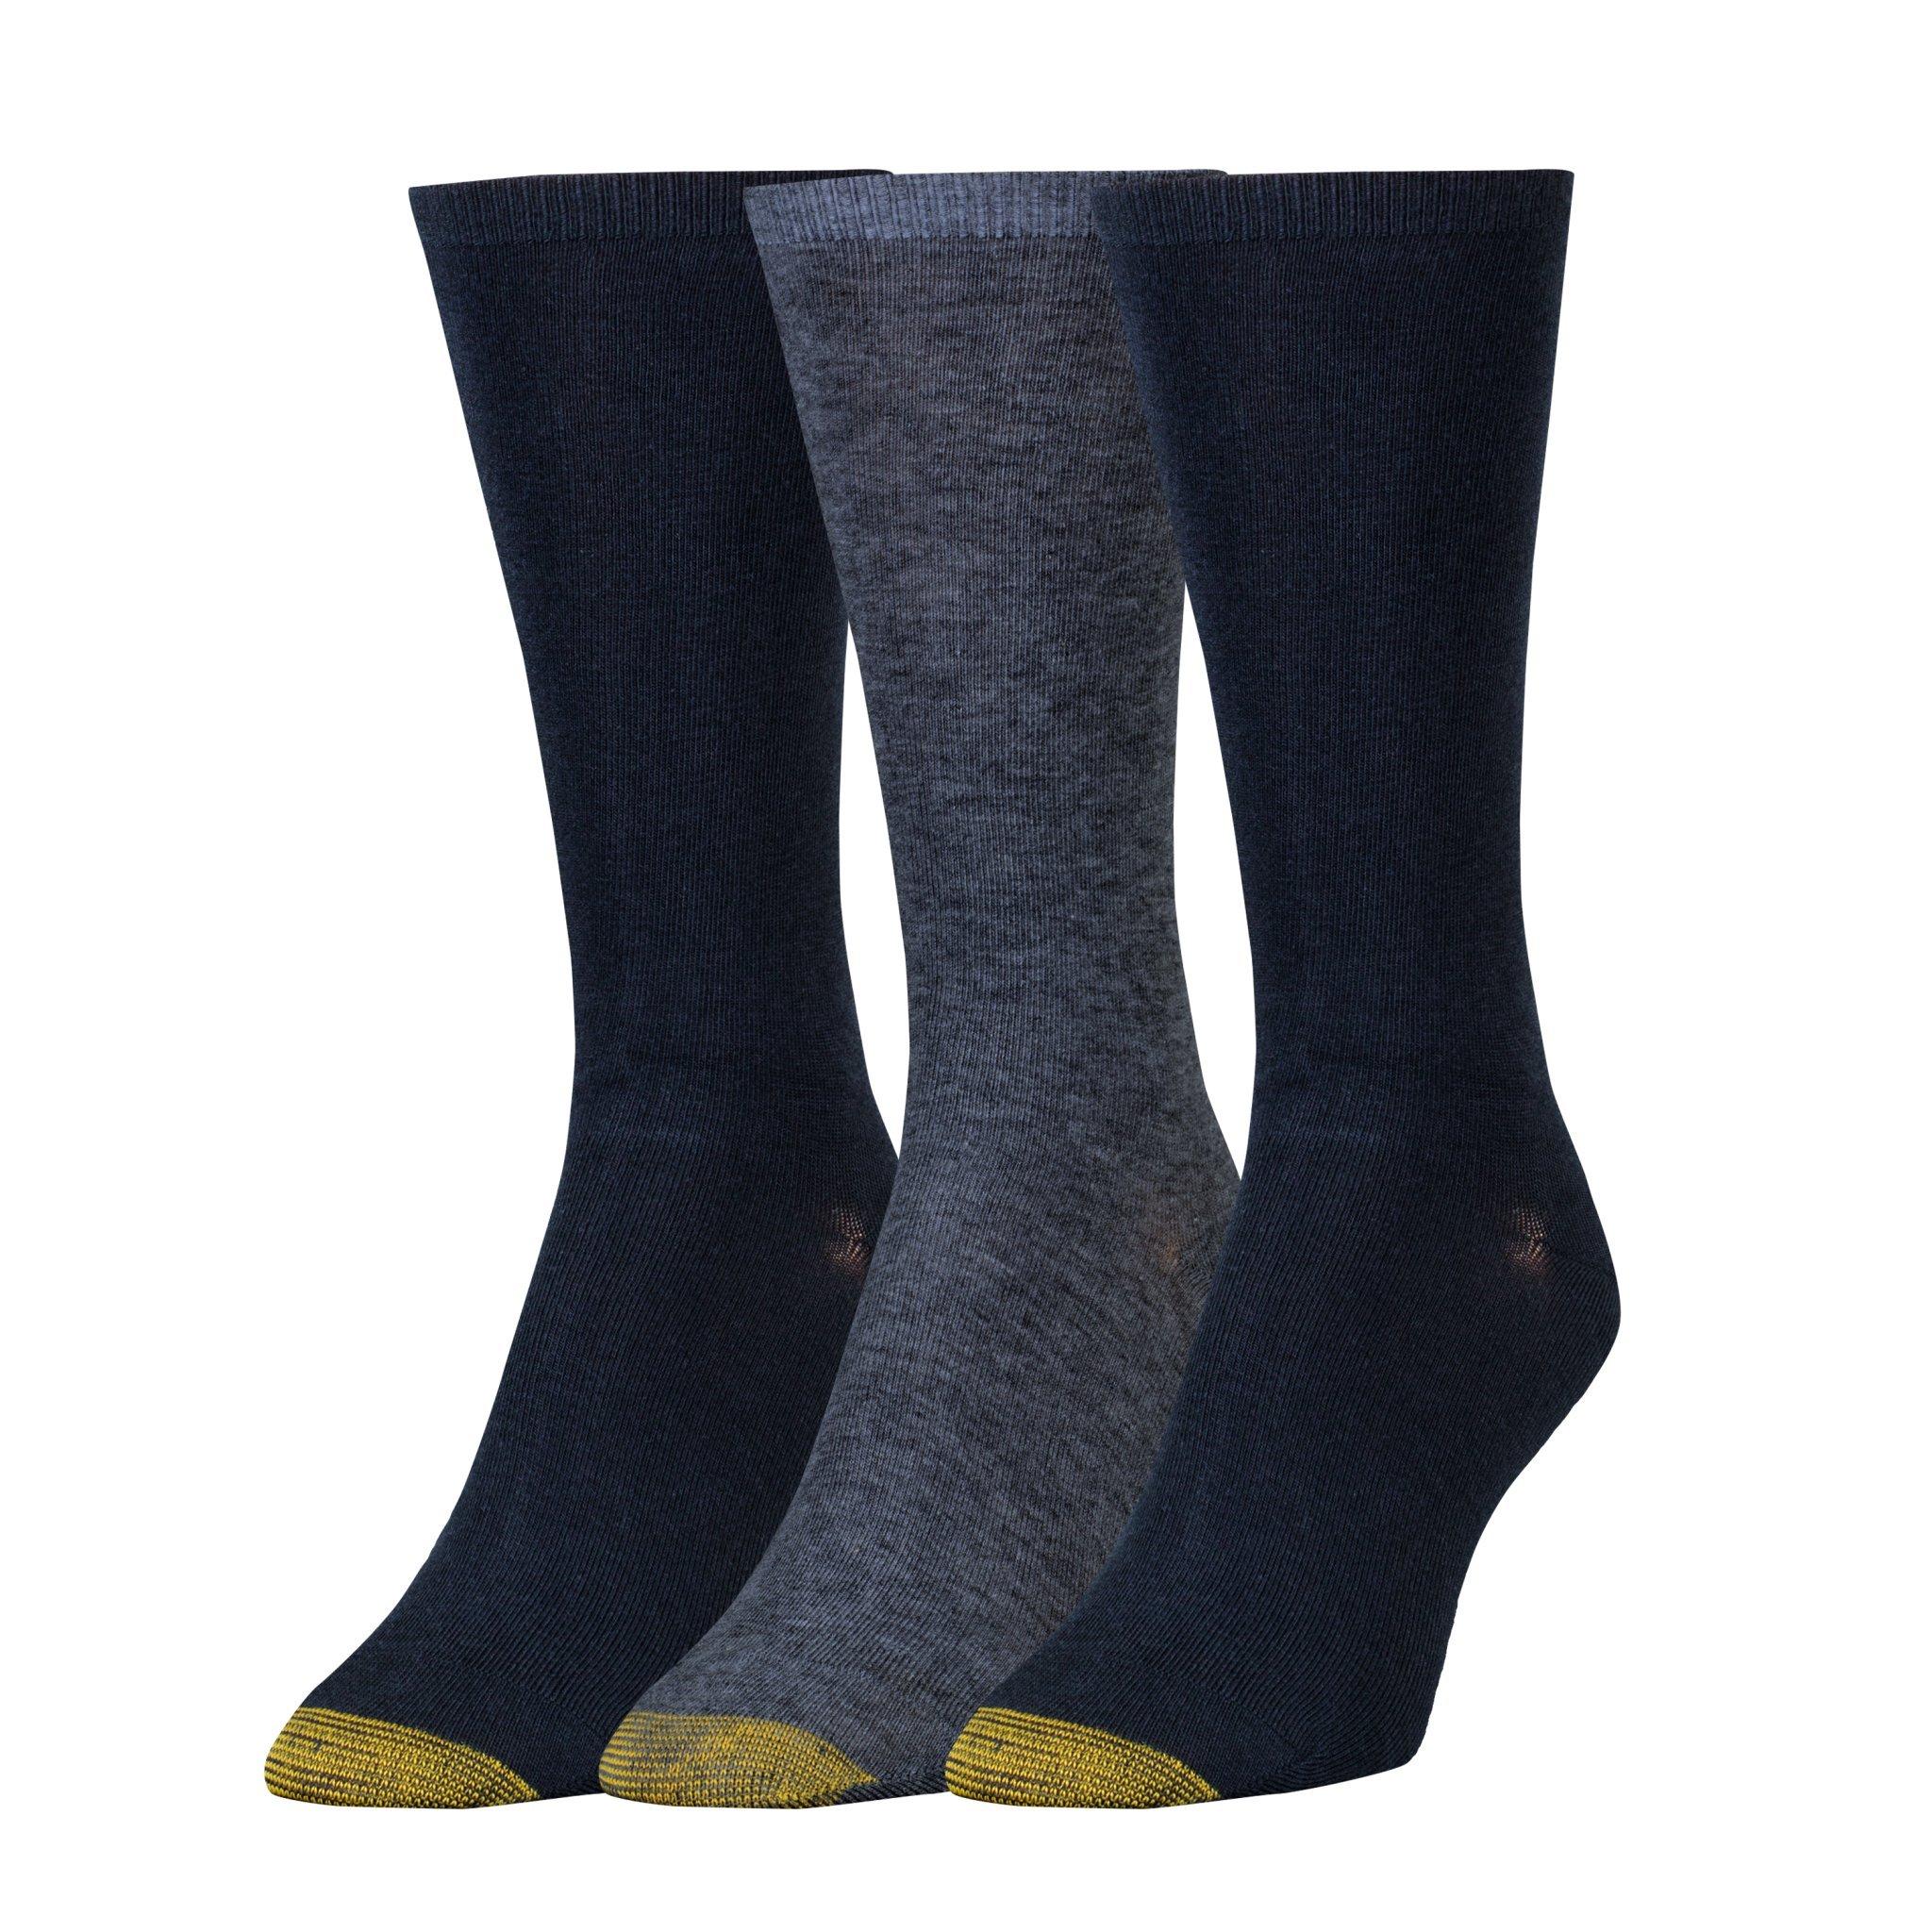 Gold Toe Women's Non-Binding Flat Knit Crew Socks, 3 Pairs Denim/New Navy, Shoe Size: 6-9